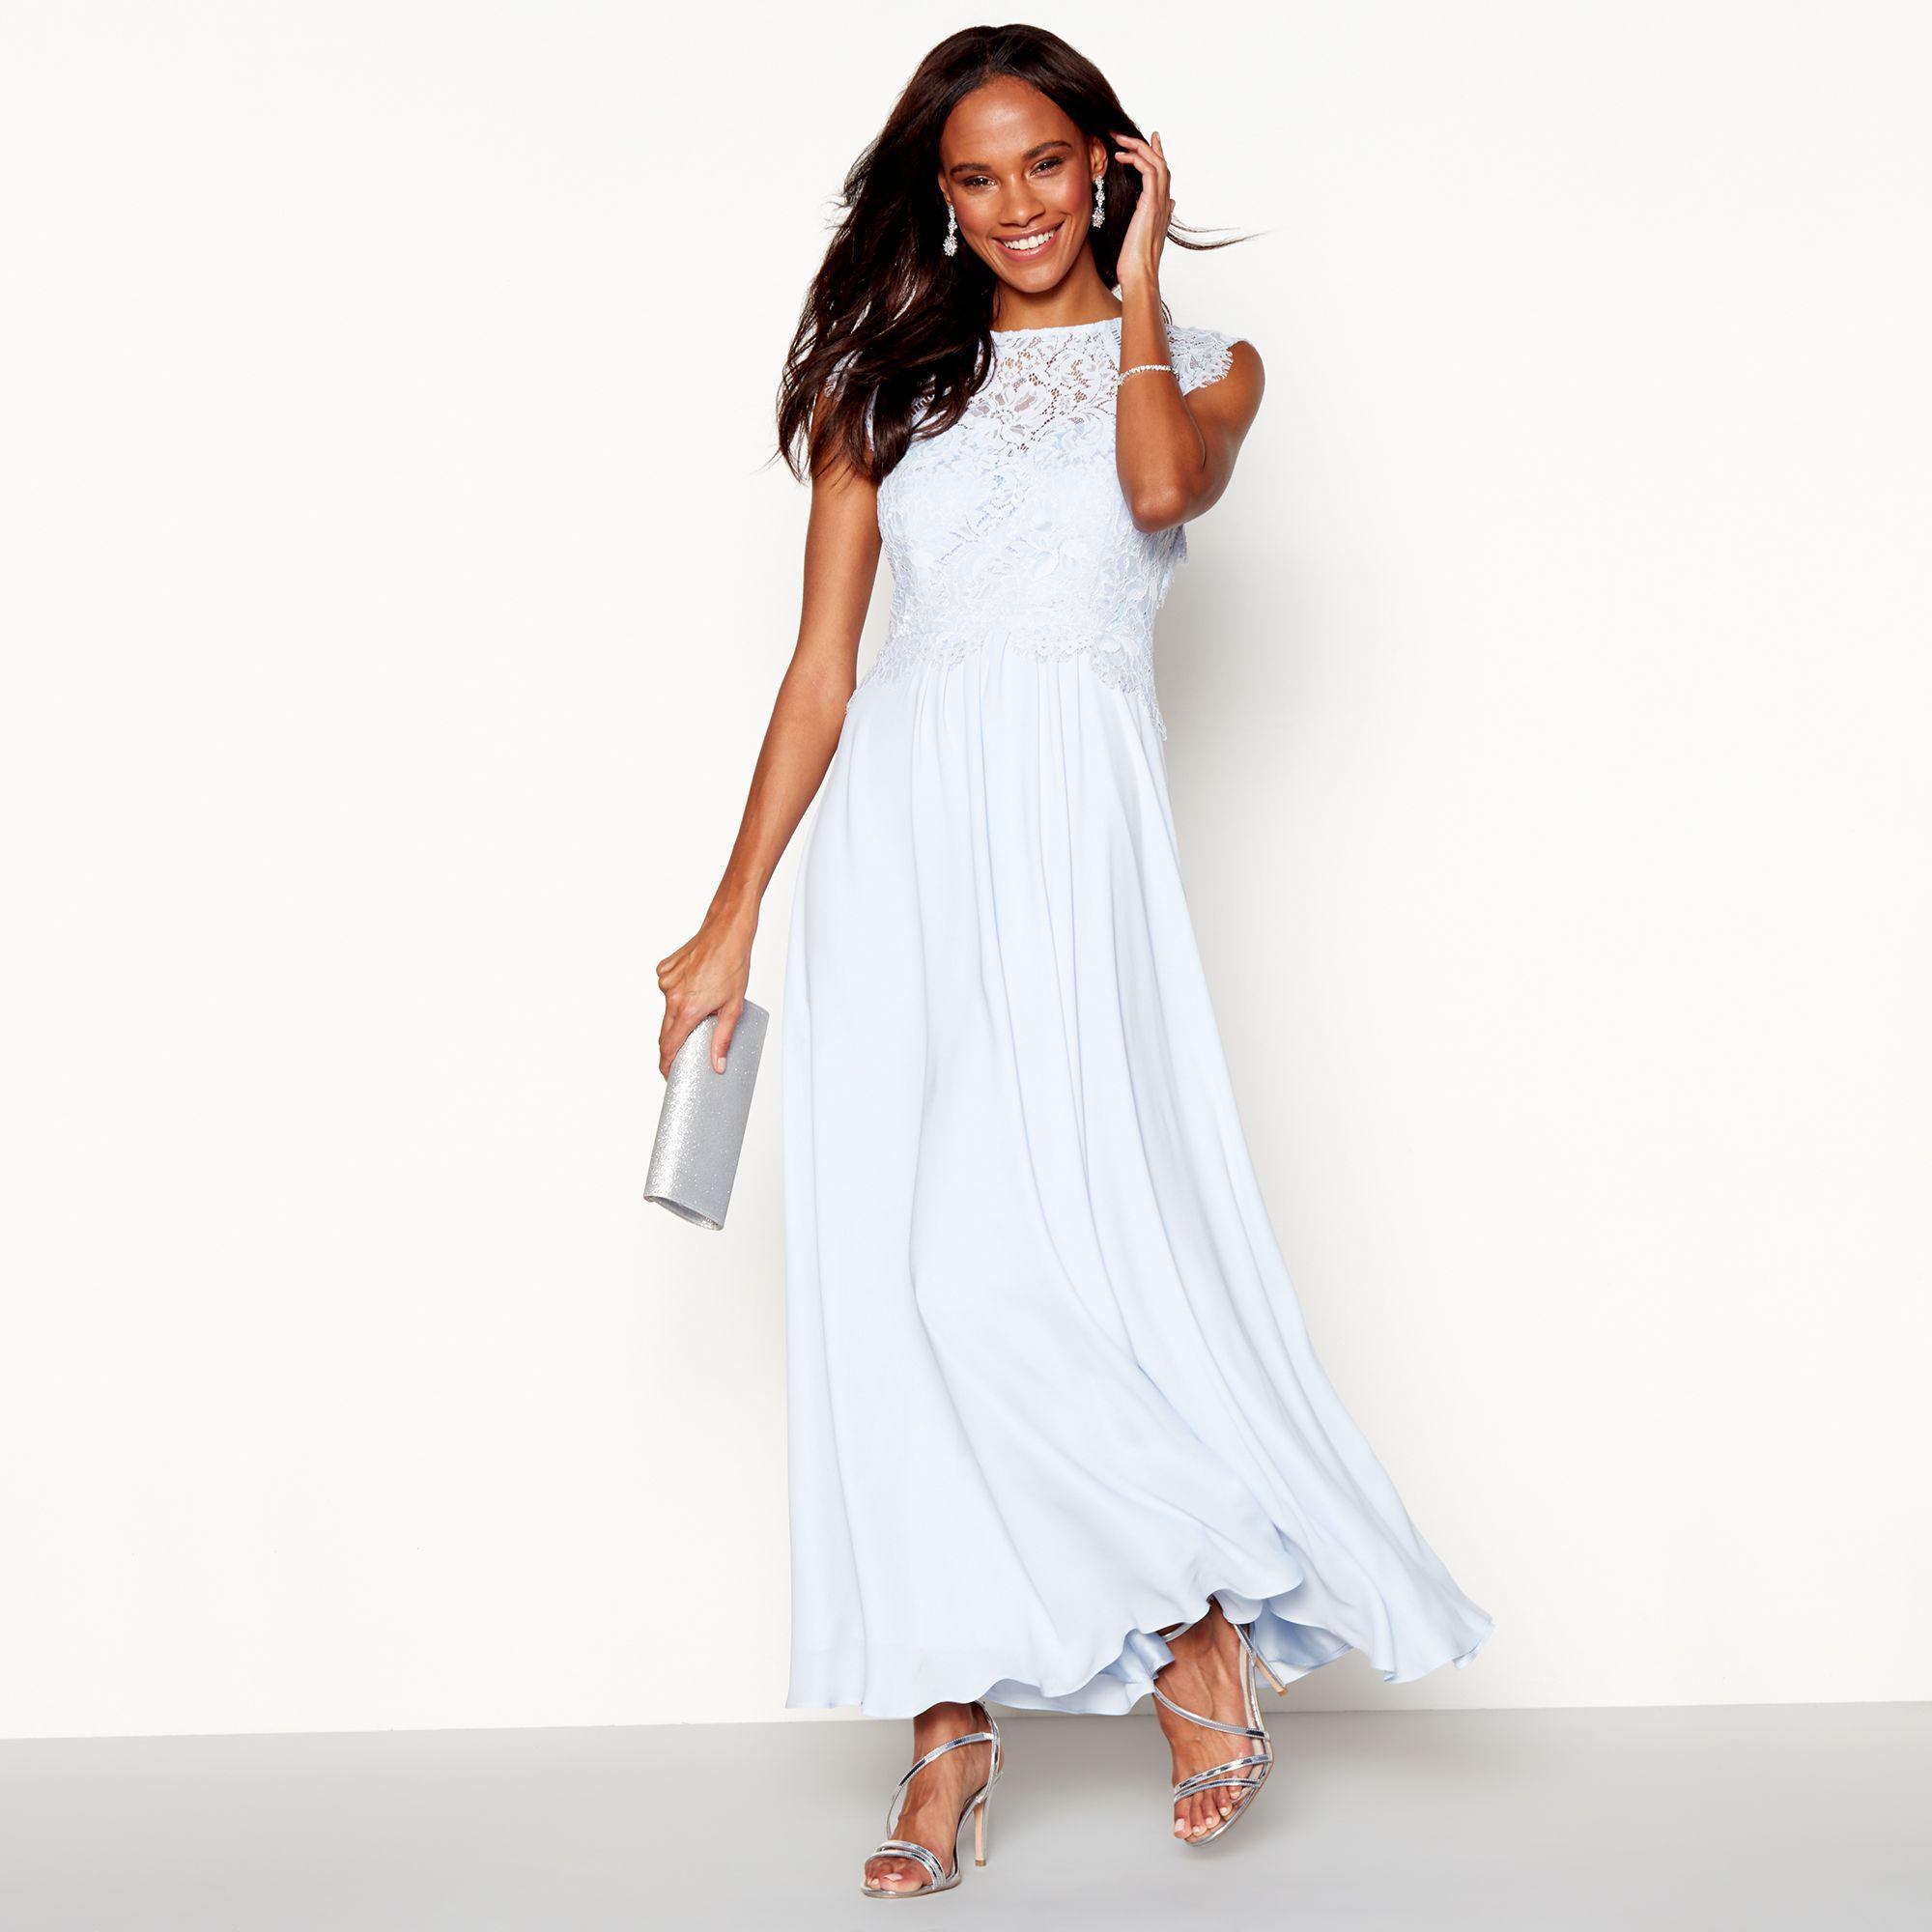 dress wed to bridesmaid blue smarter charcoal grey borrowed dresses lighting pin bridesmaidsbridesmaid way light the